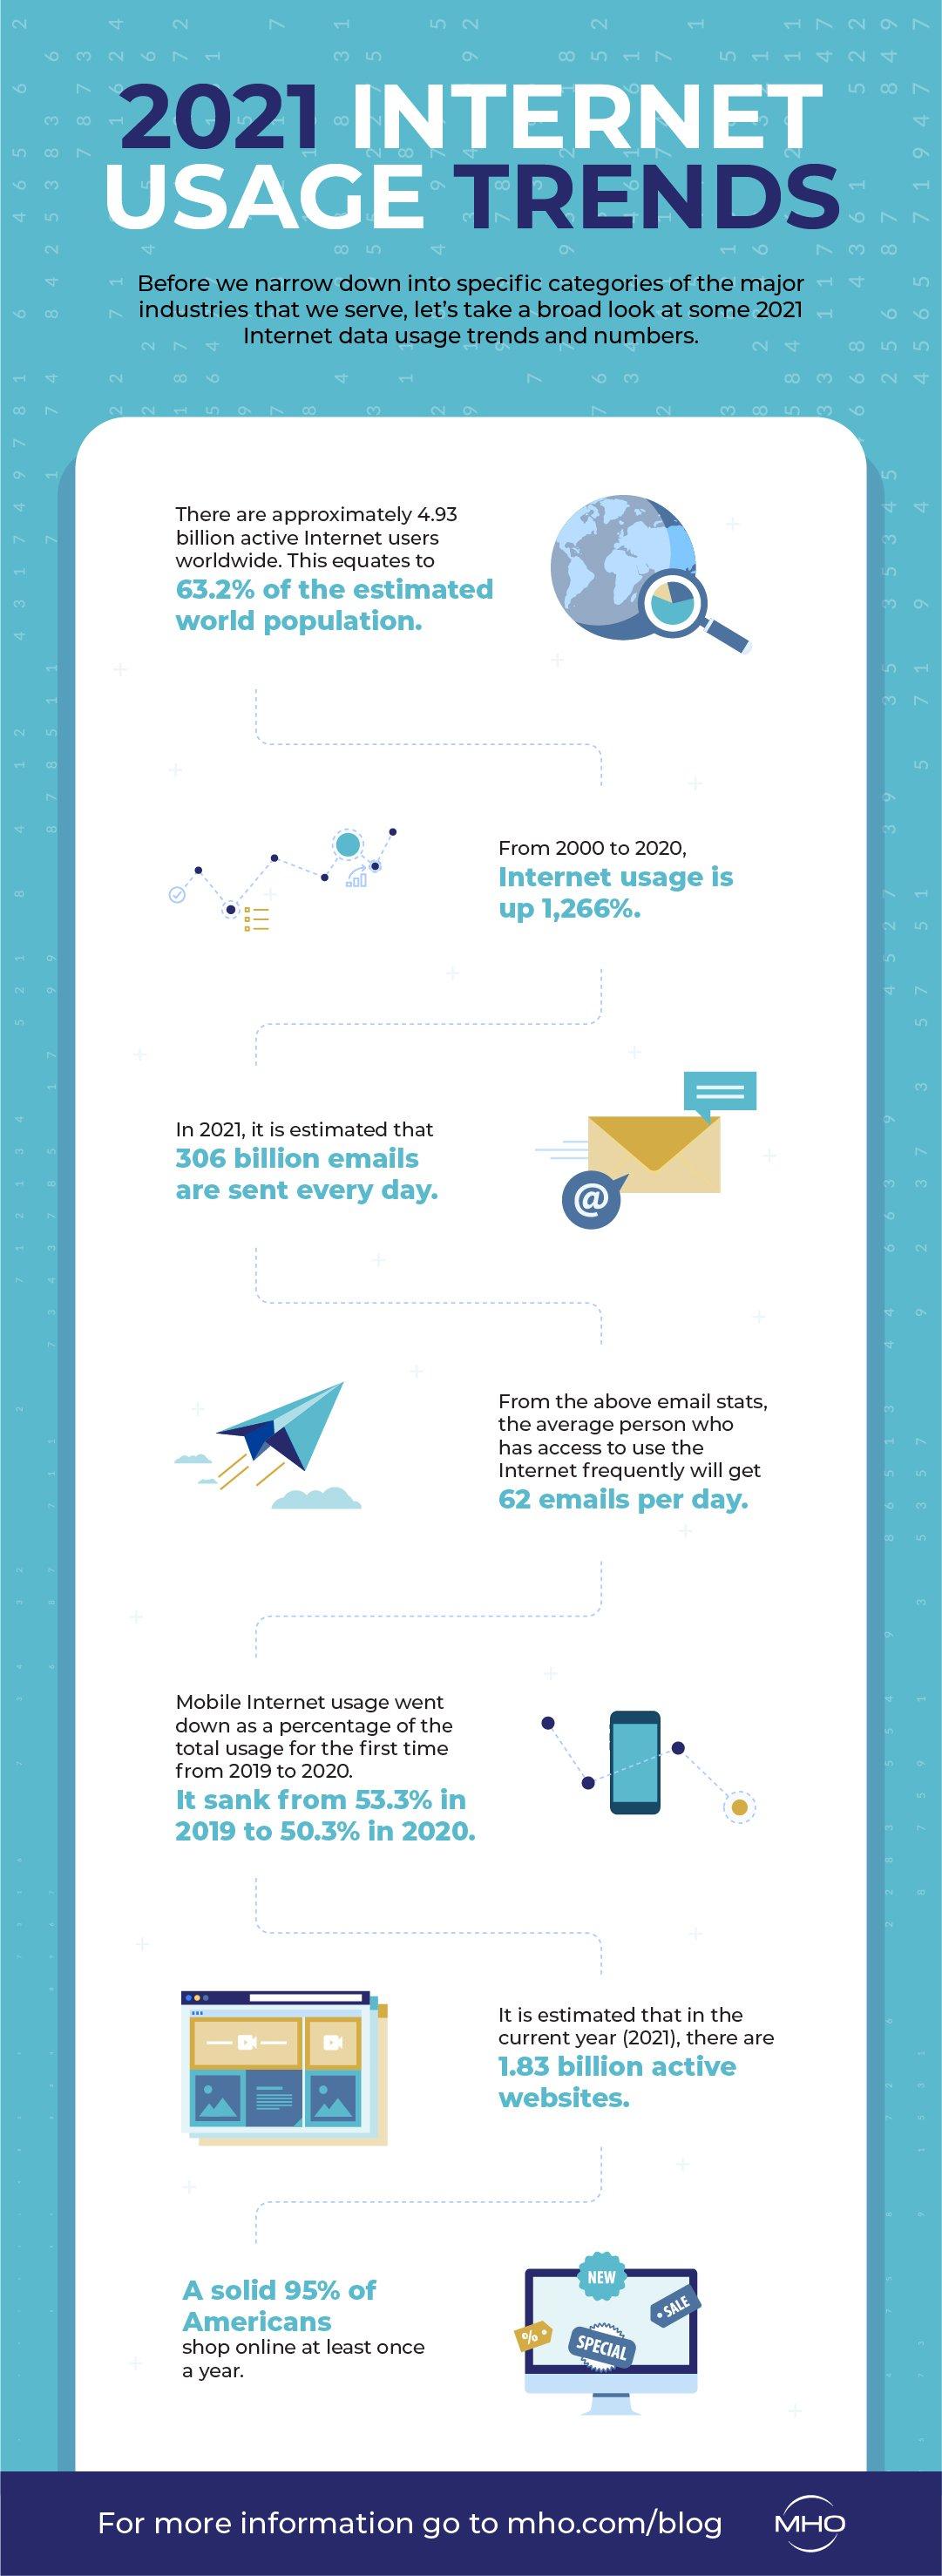 2021 Internet Usage Trends